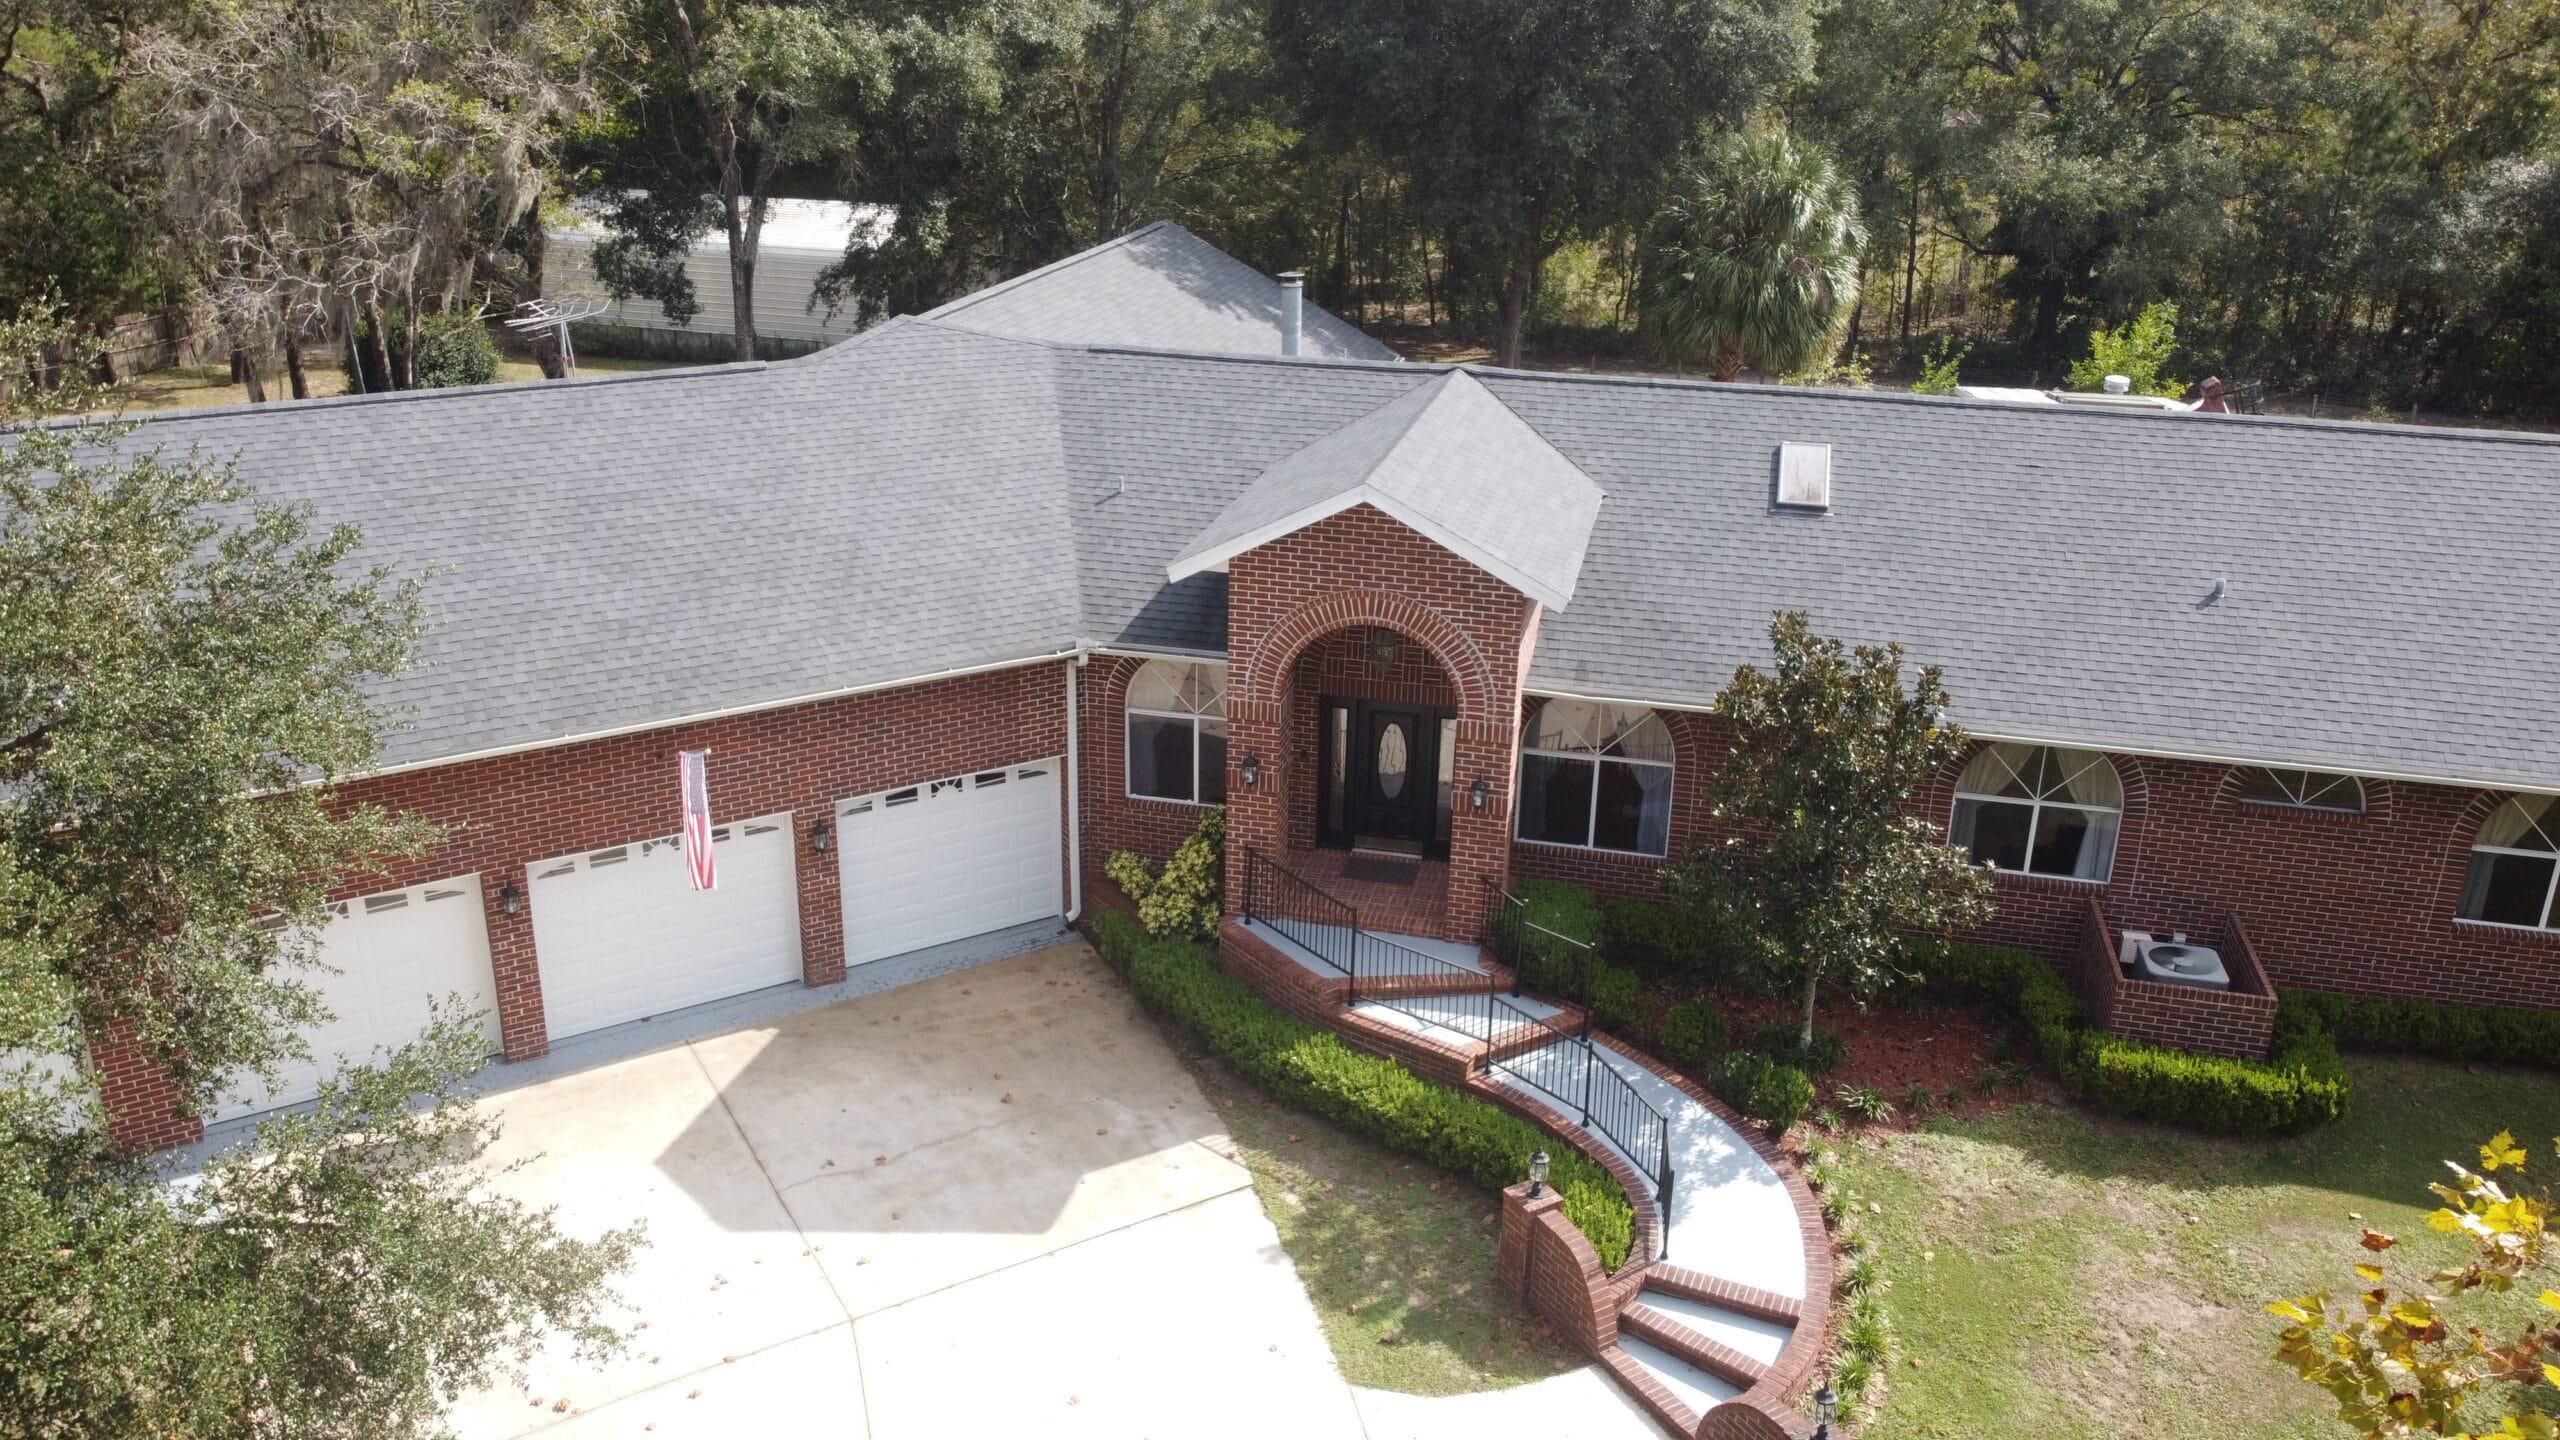 6 Bedroom Brick Home on 5.08 Acres in High Springs